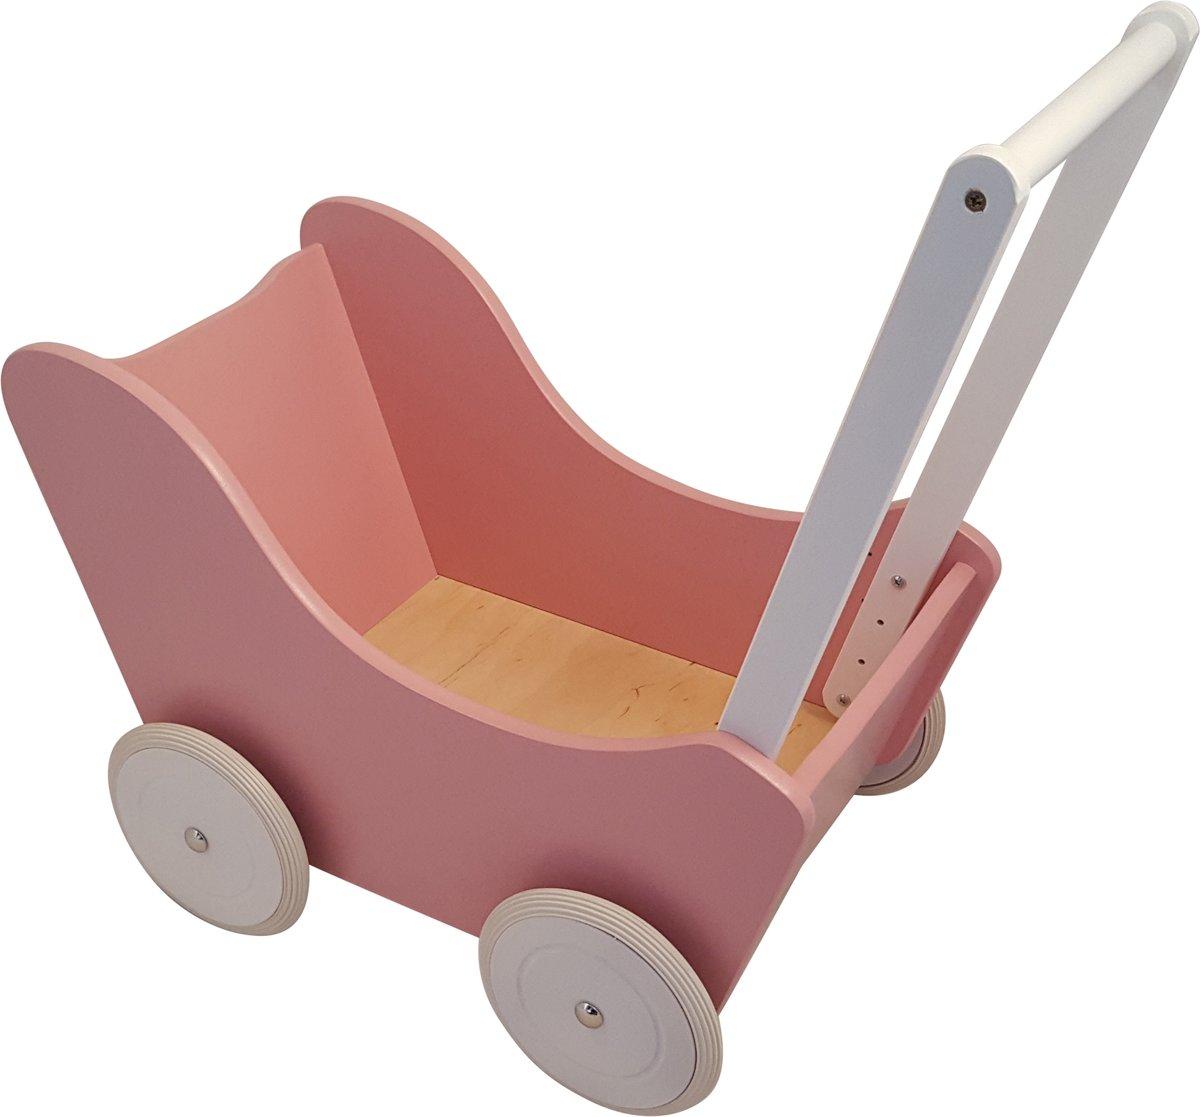 Playwood - Houten Poppenwagen roze met witte wielen